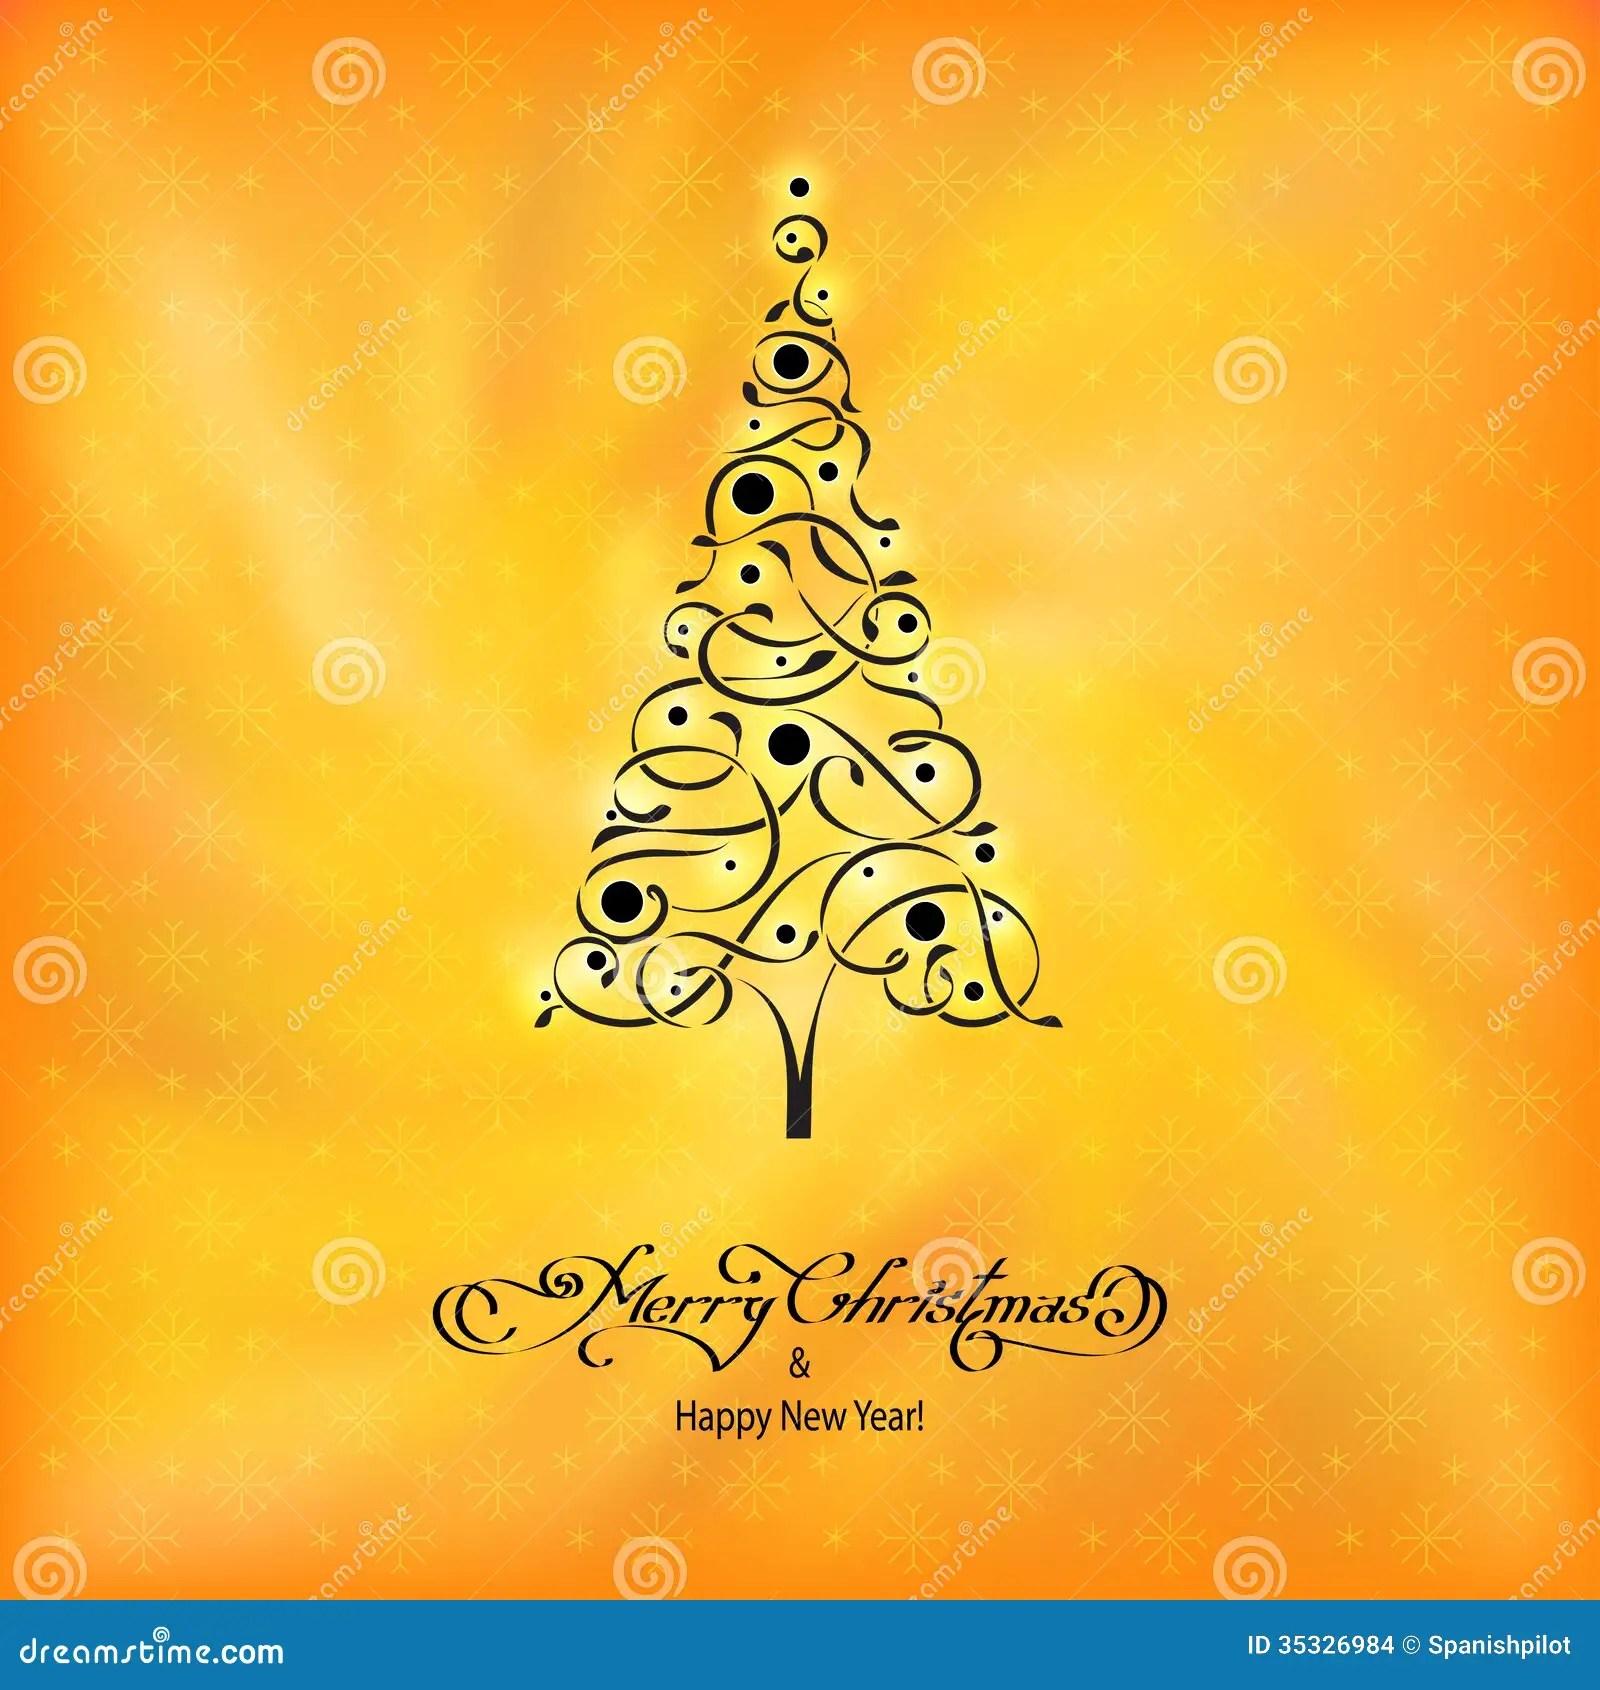 Black Ornamental Tree Stock Photo Image Of Creative